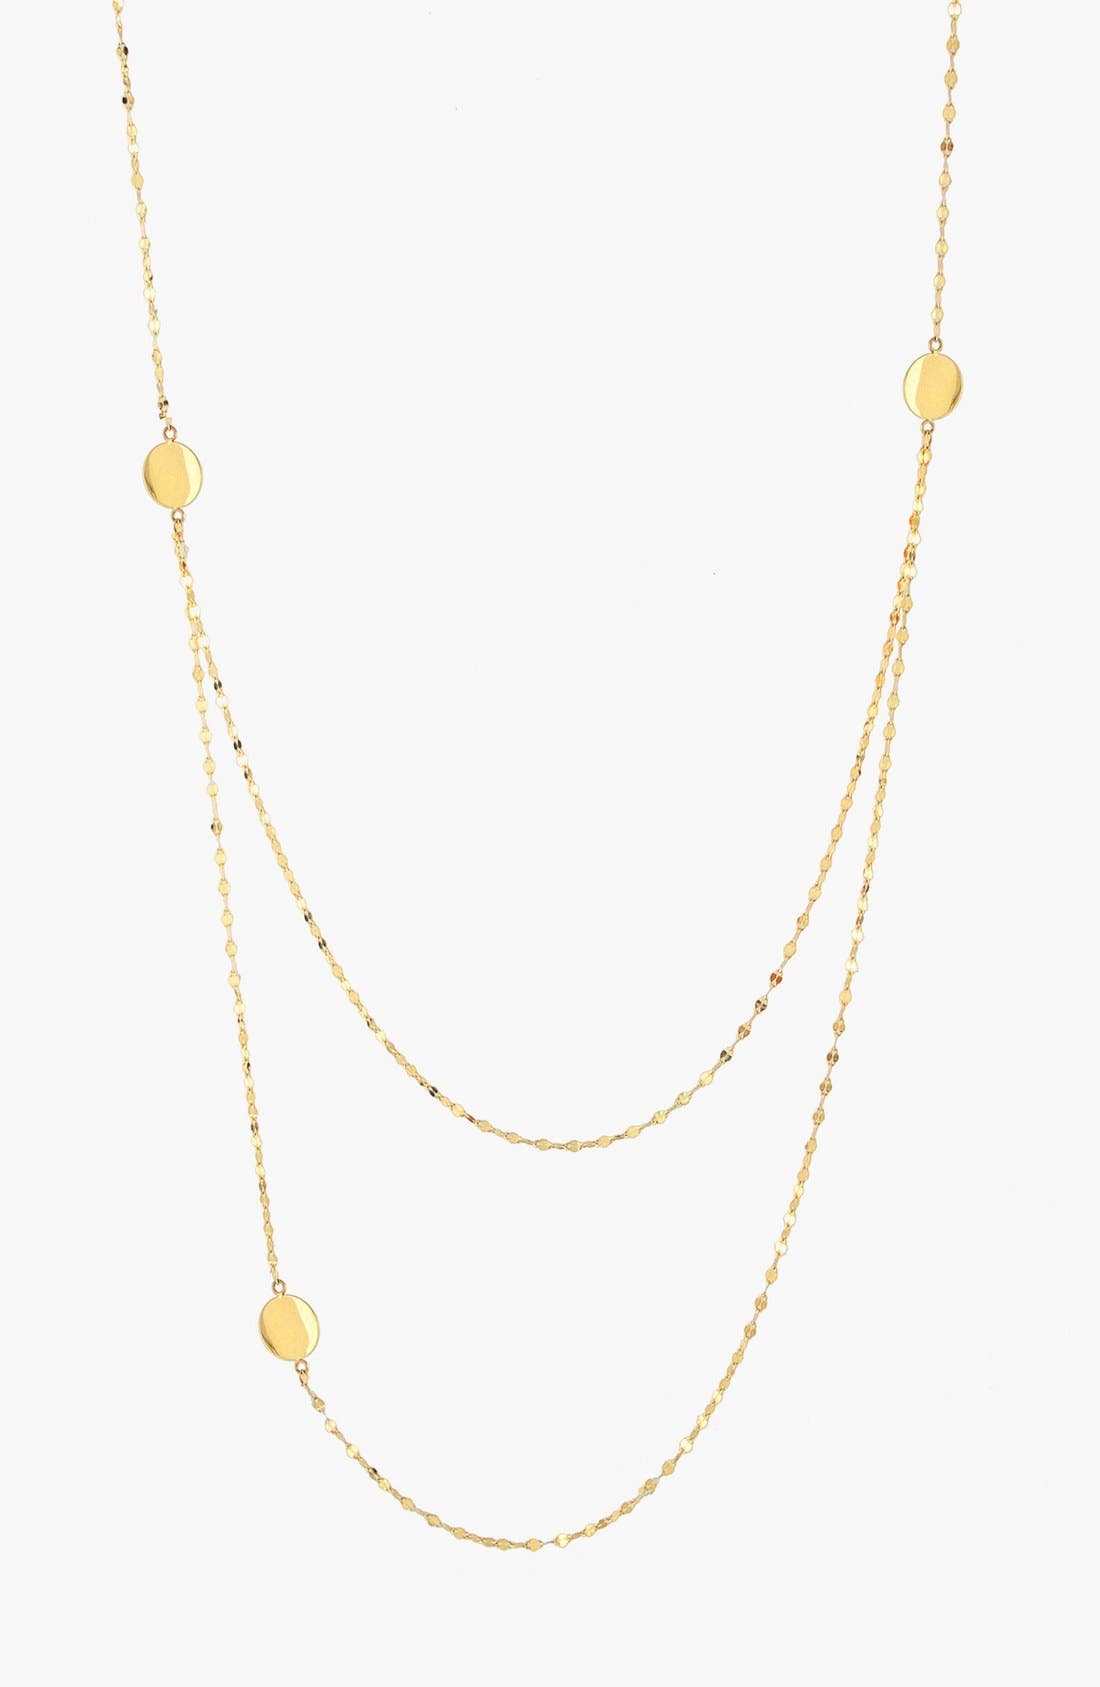 Main Image - Lana Jewelry Tri Disc Necklace